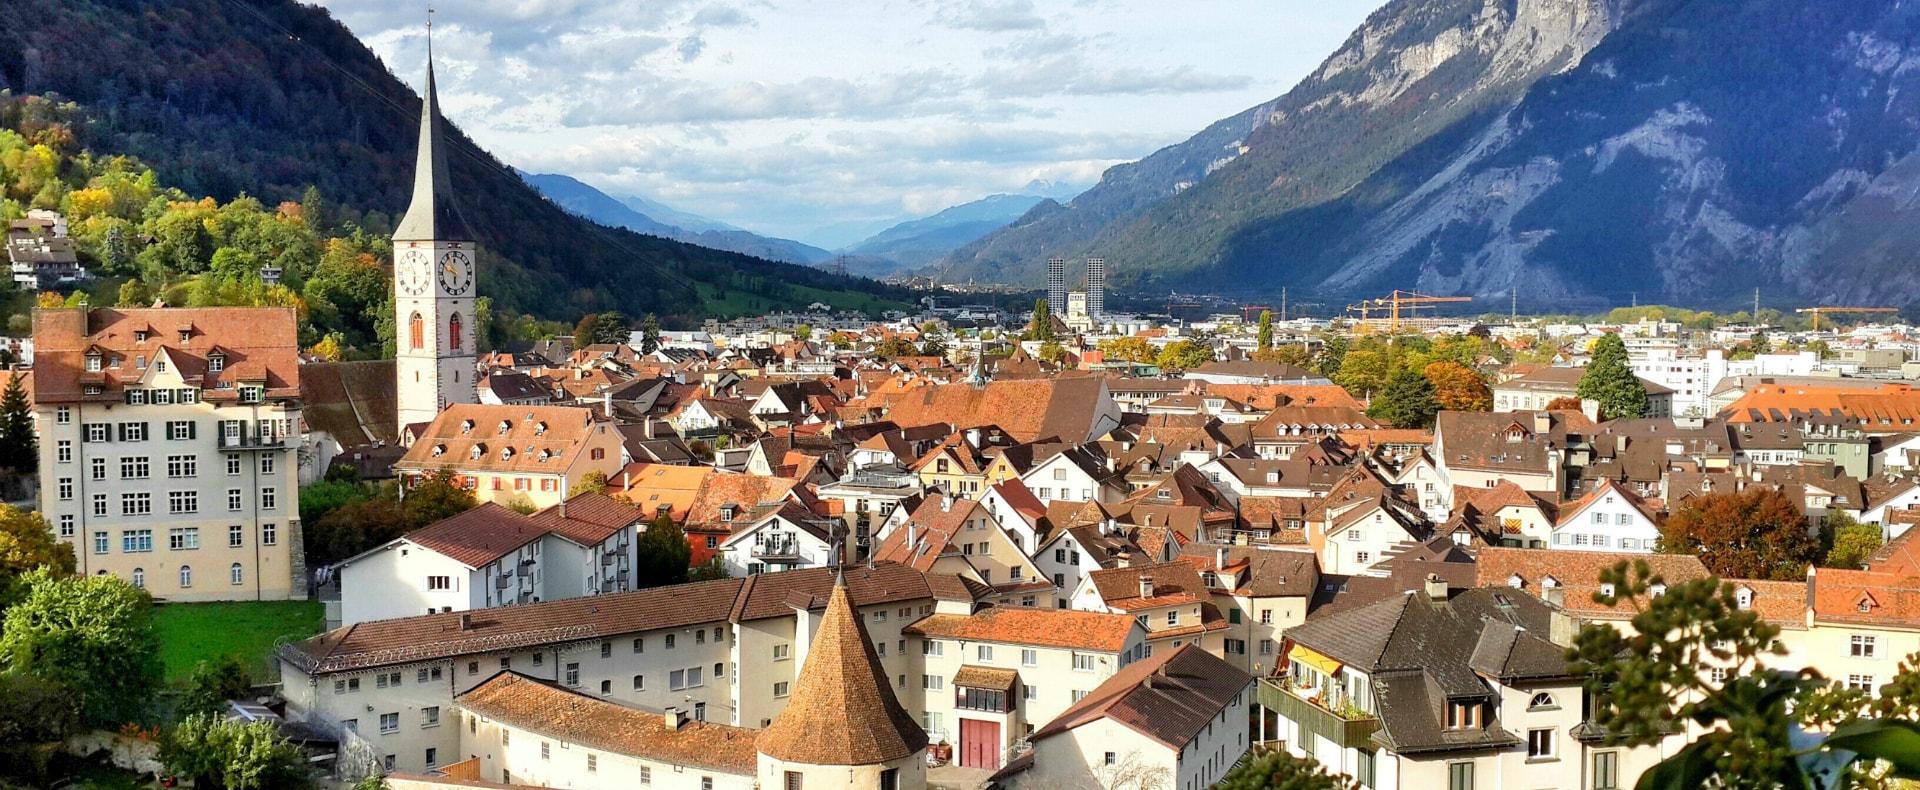 Chur, Switzerland gallery